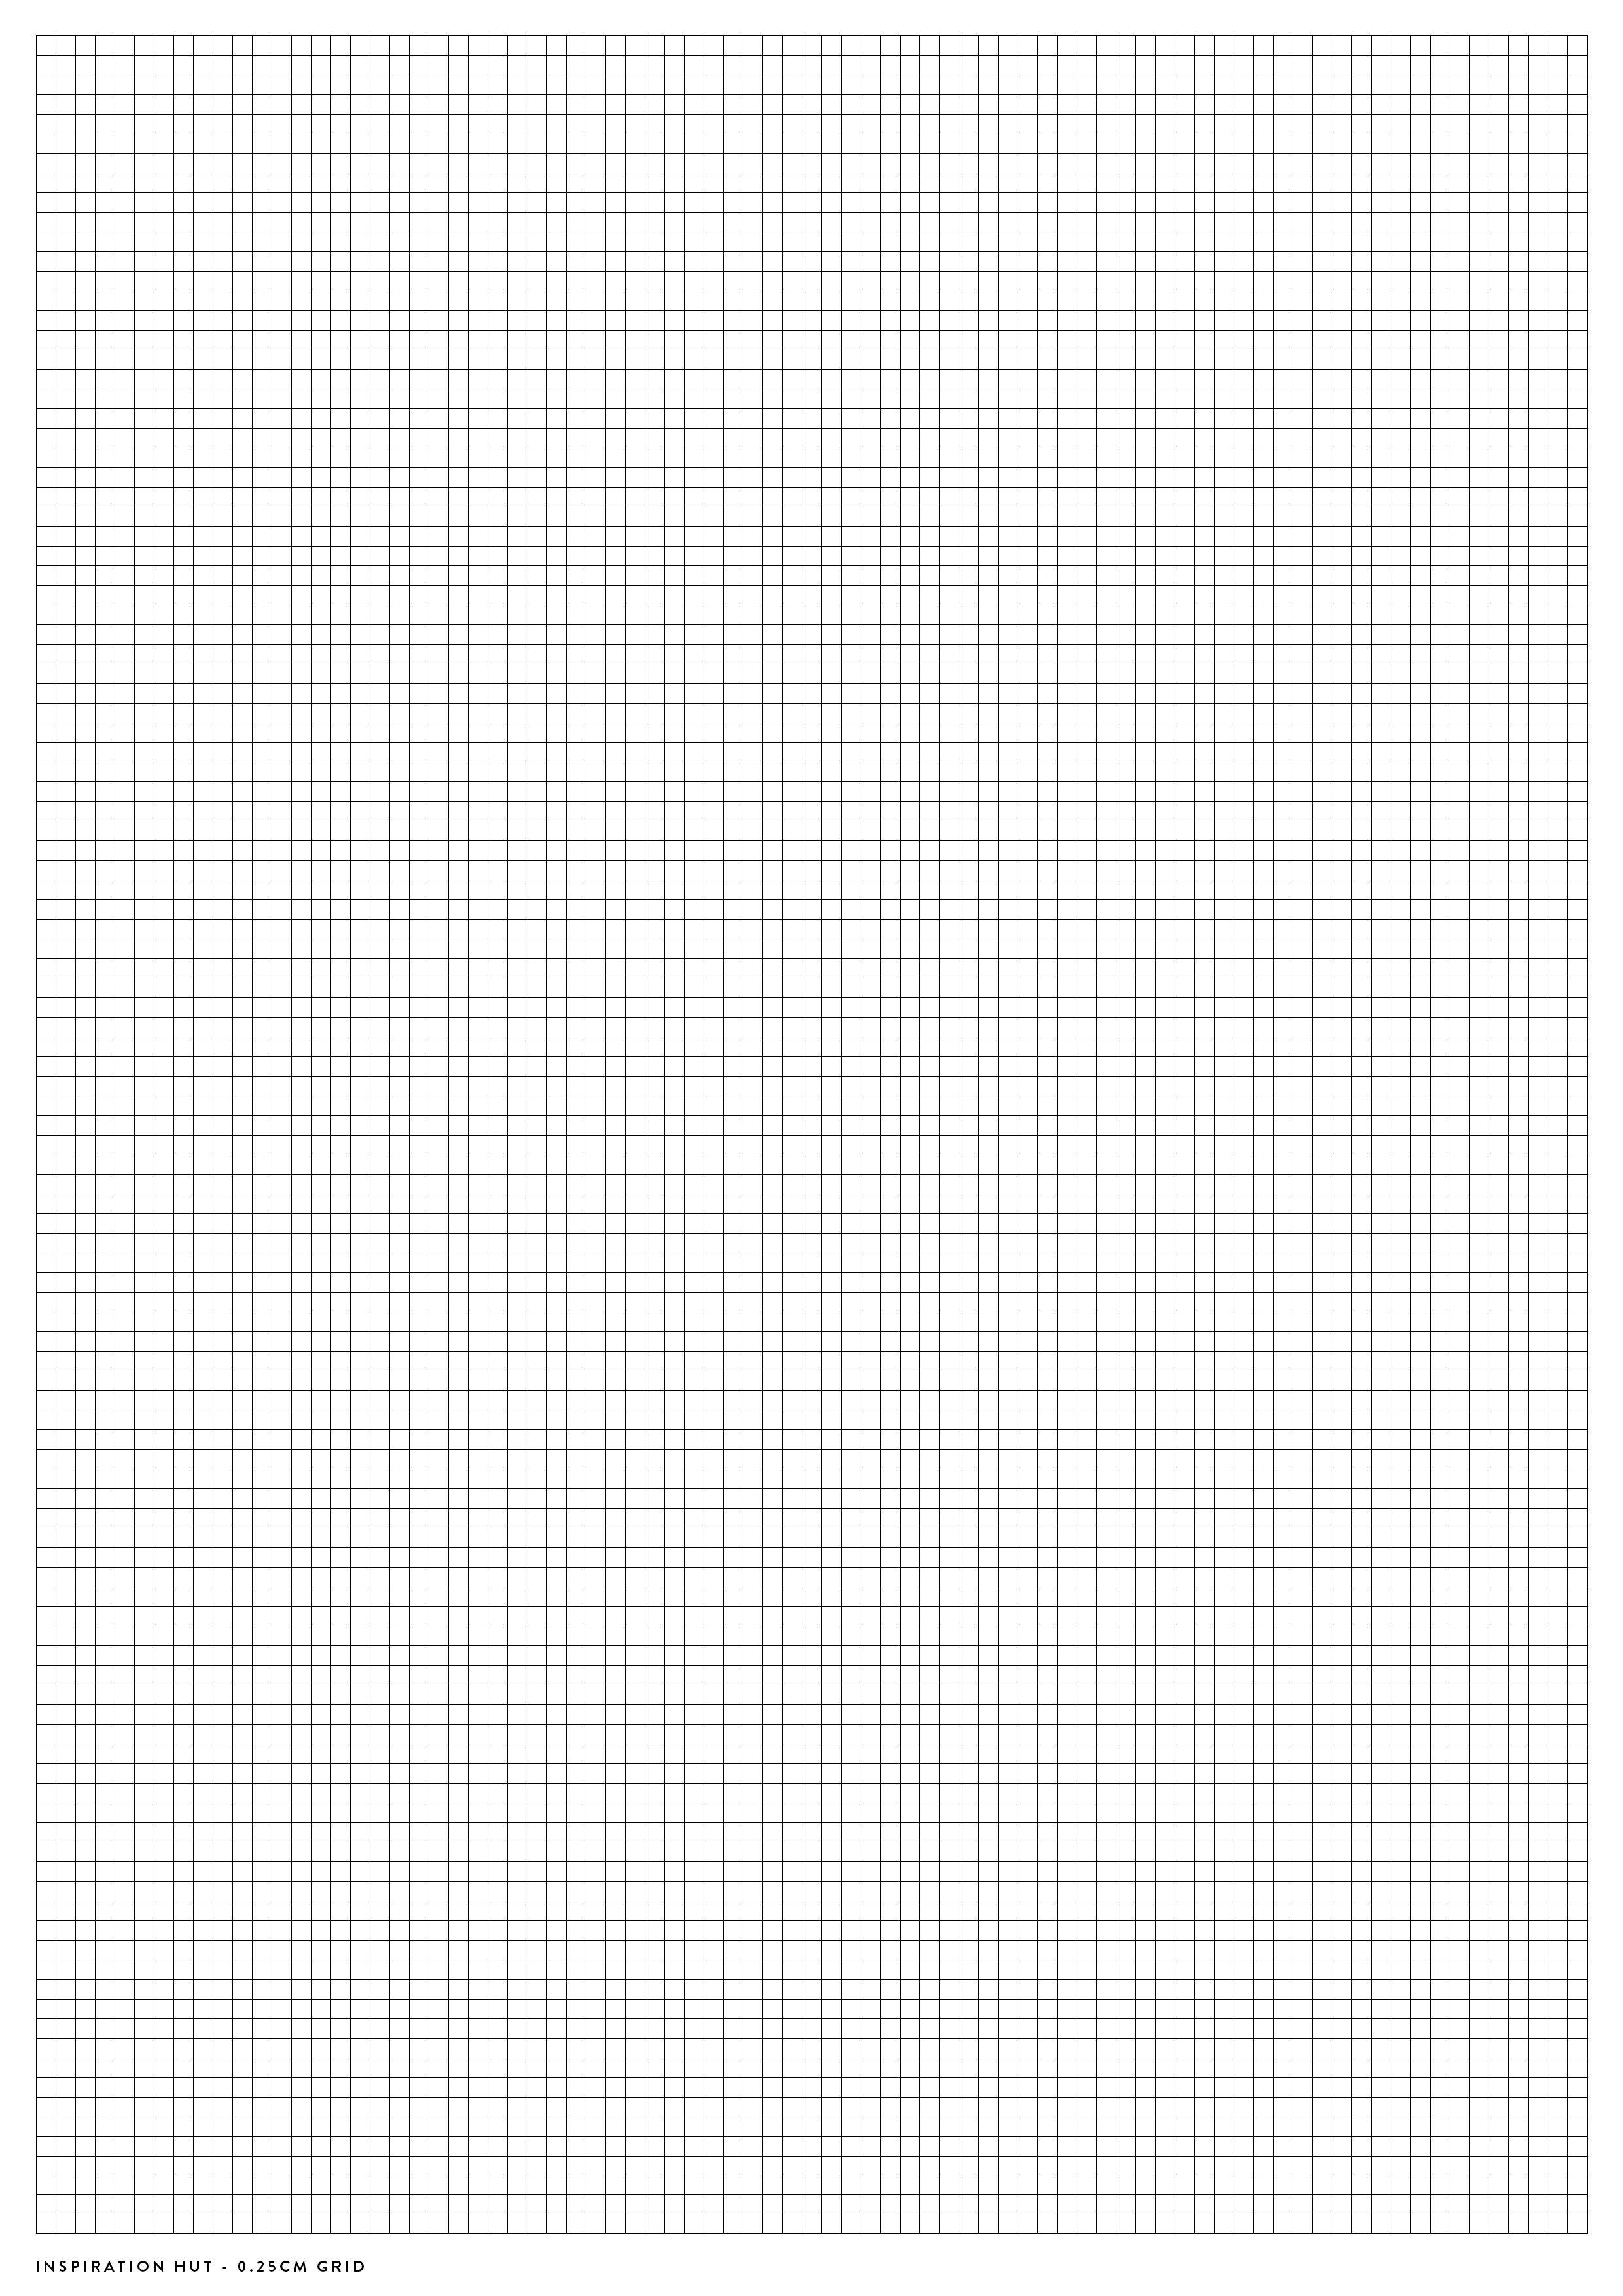 Printable Graph Grid Paper Pdf Templates Inspiration Hut Printable Graph Paper Grid Paper Graph Paper Graph paper to print out